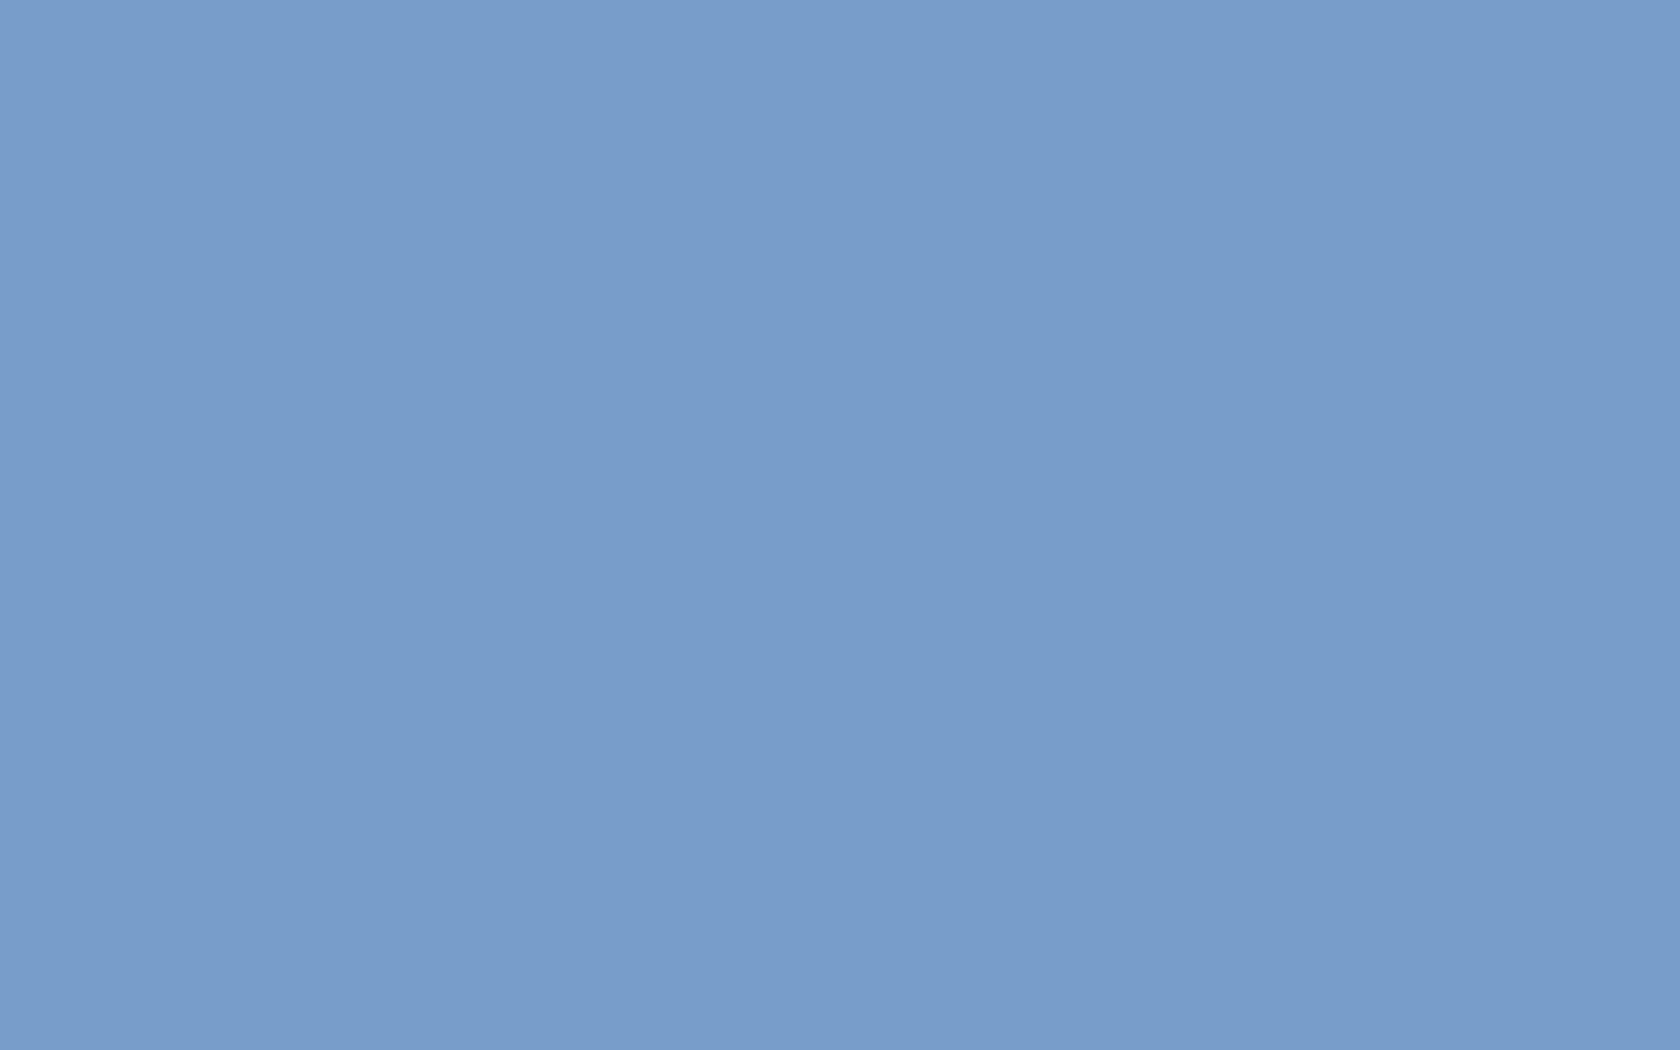 1680x1050 Dark Pastel Blue Solid Color Background